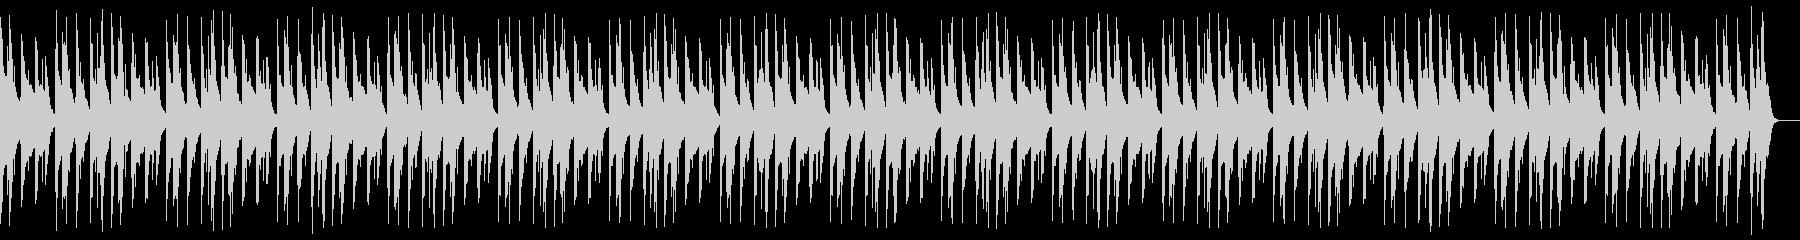 Metro Boomin  Beatの未再生の波形